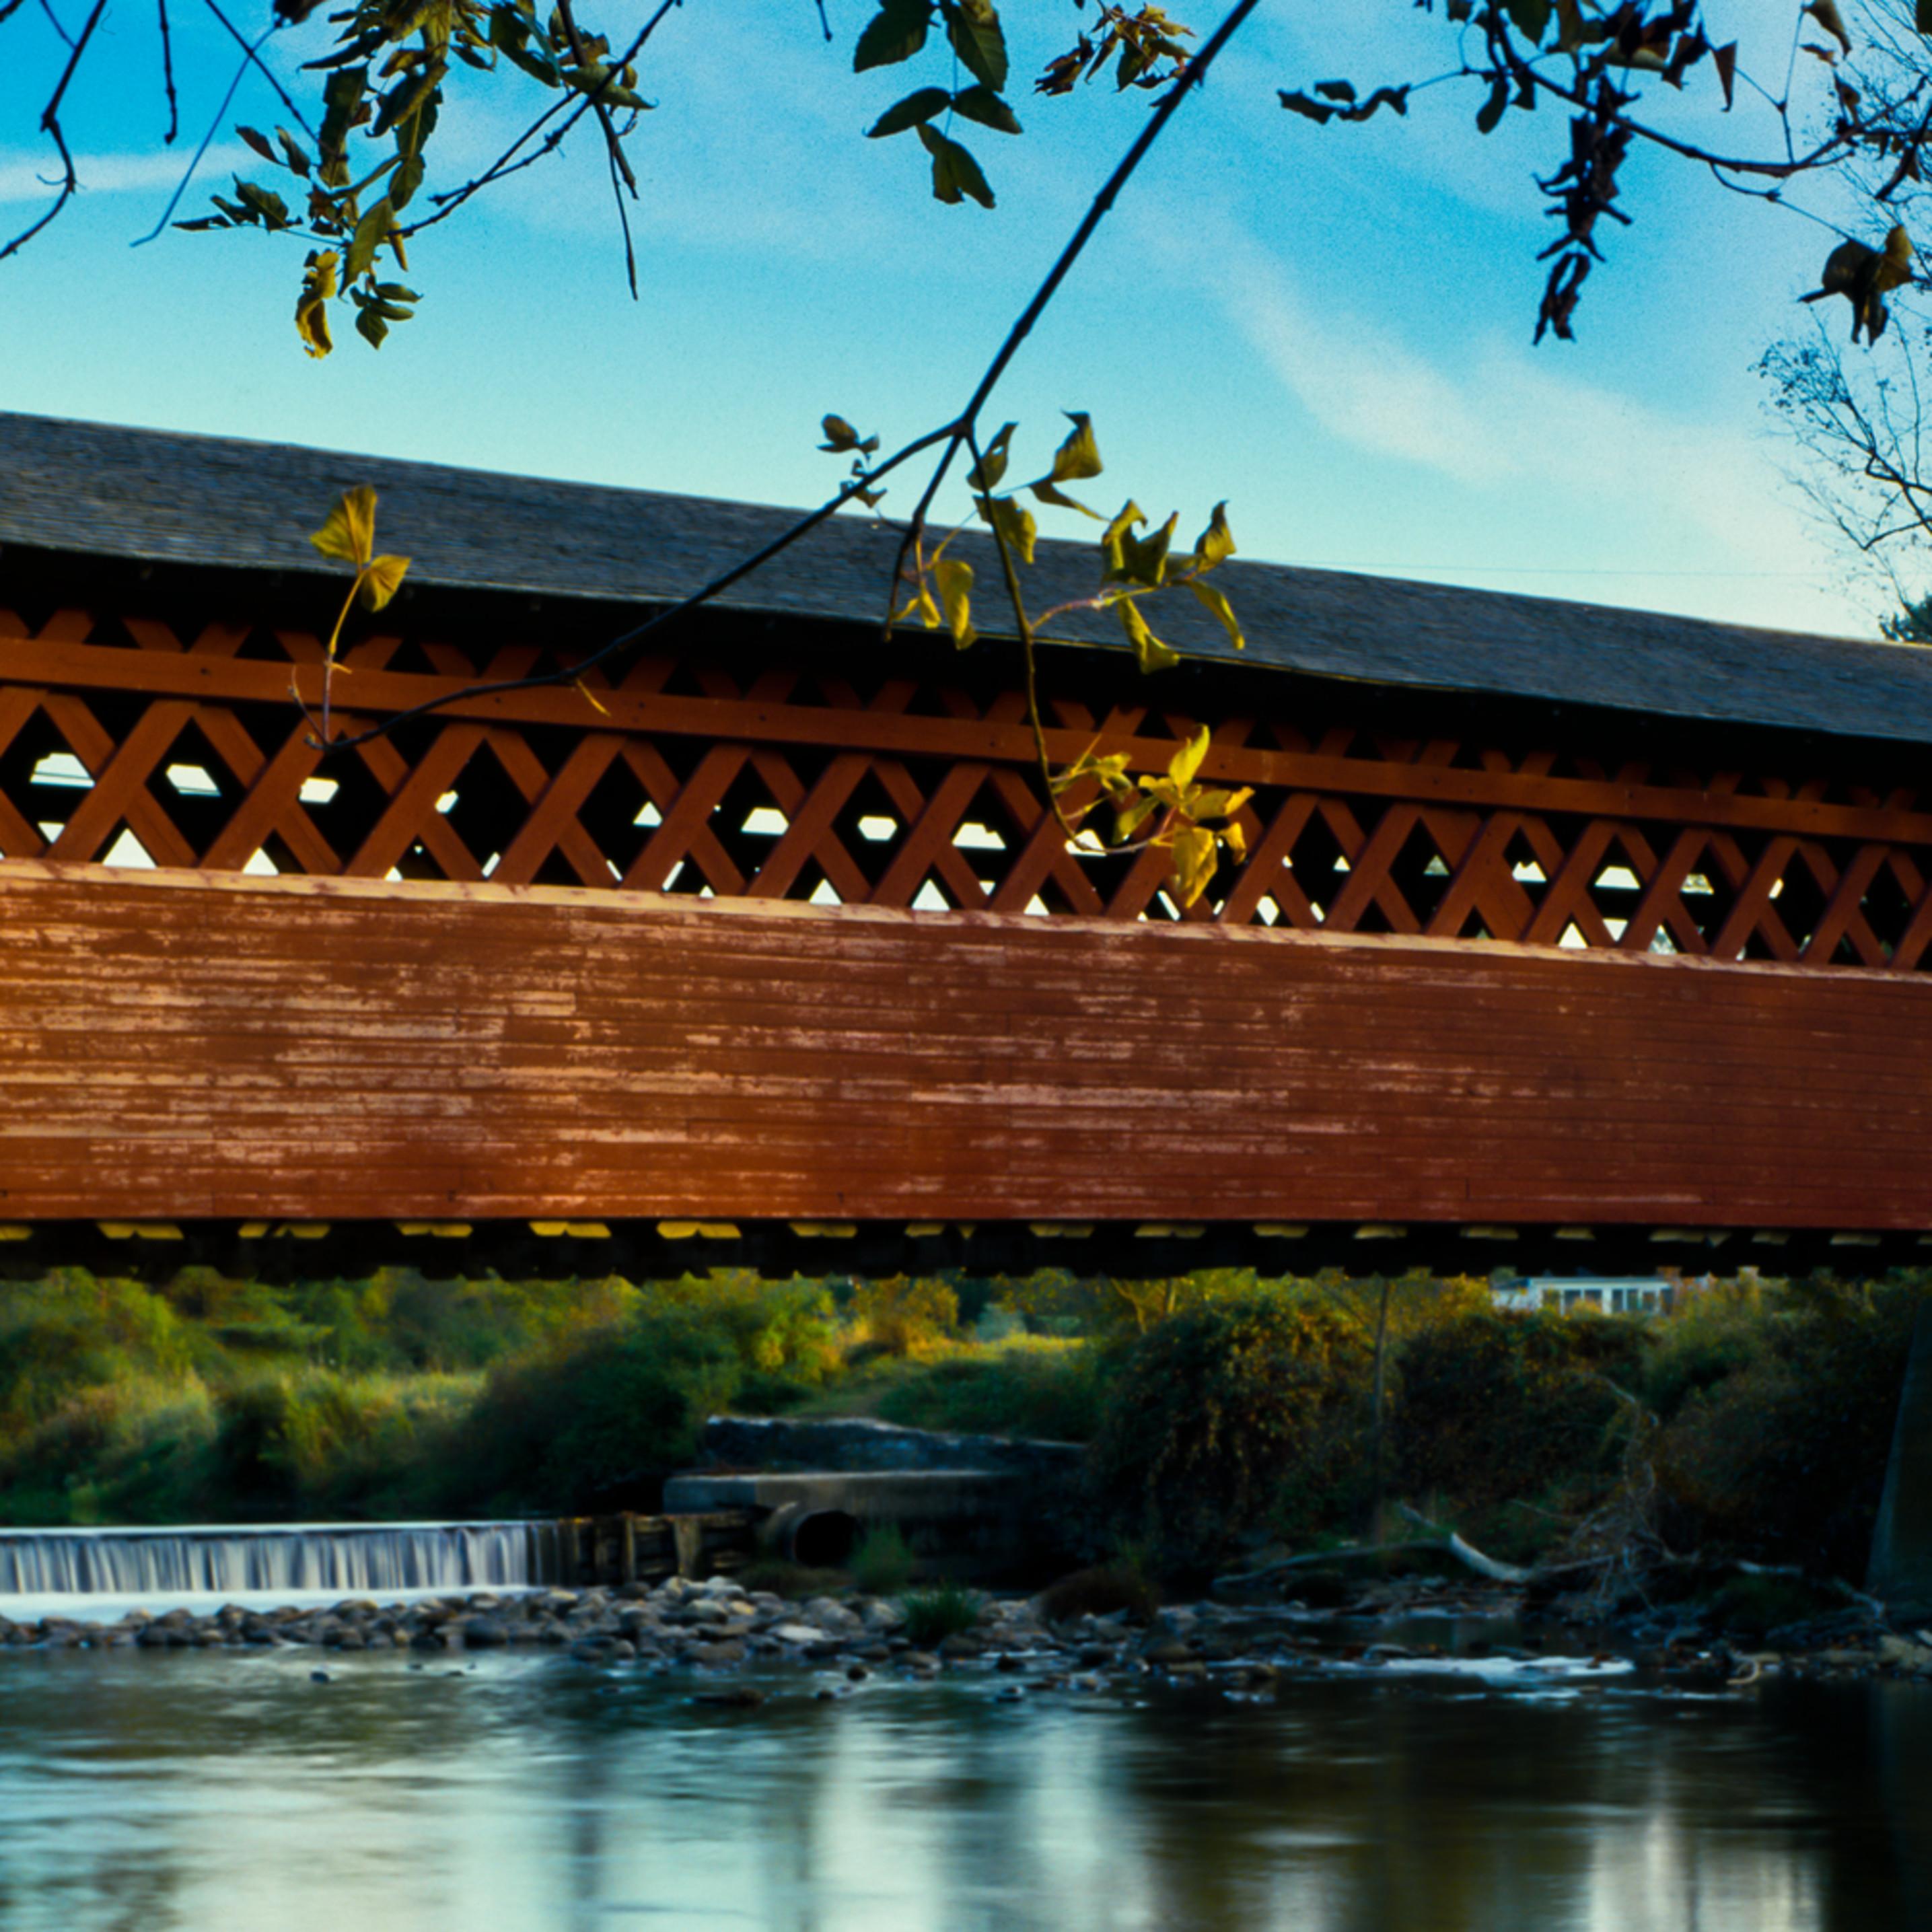 The henry covered bridge bdvjms